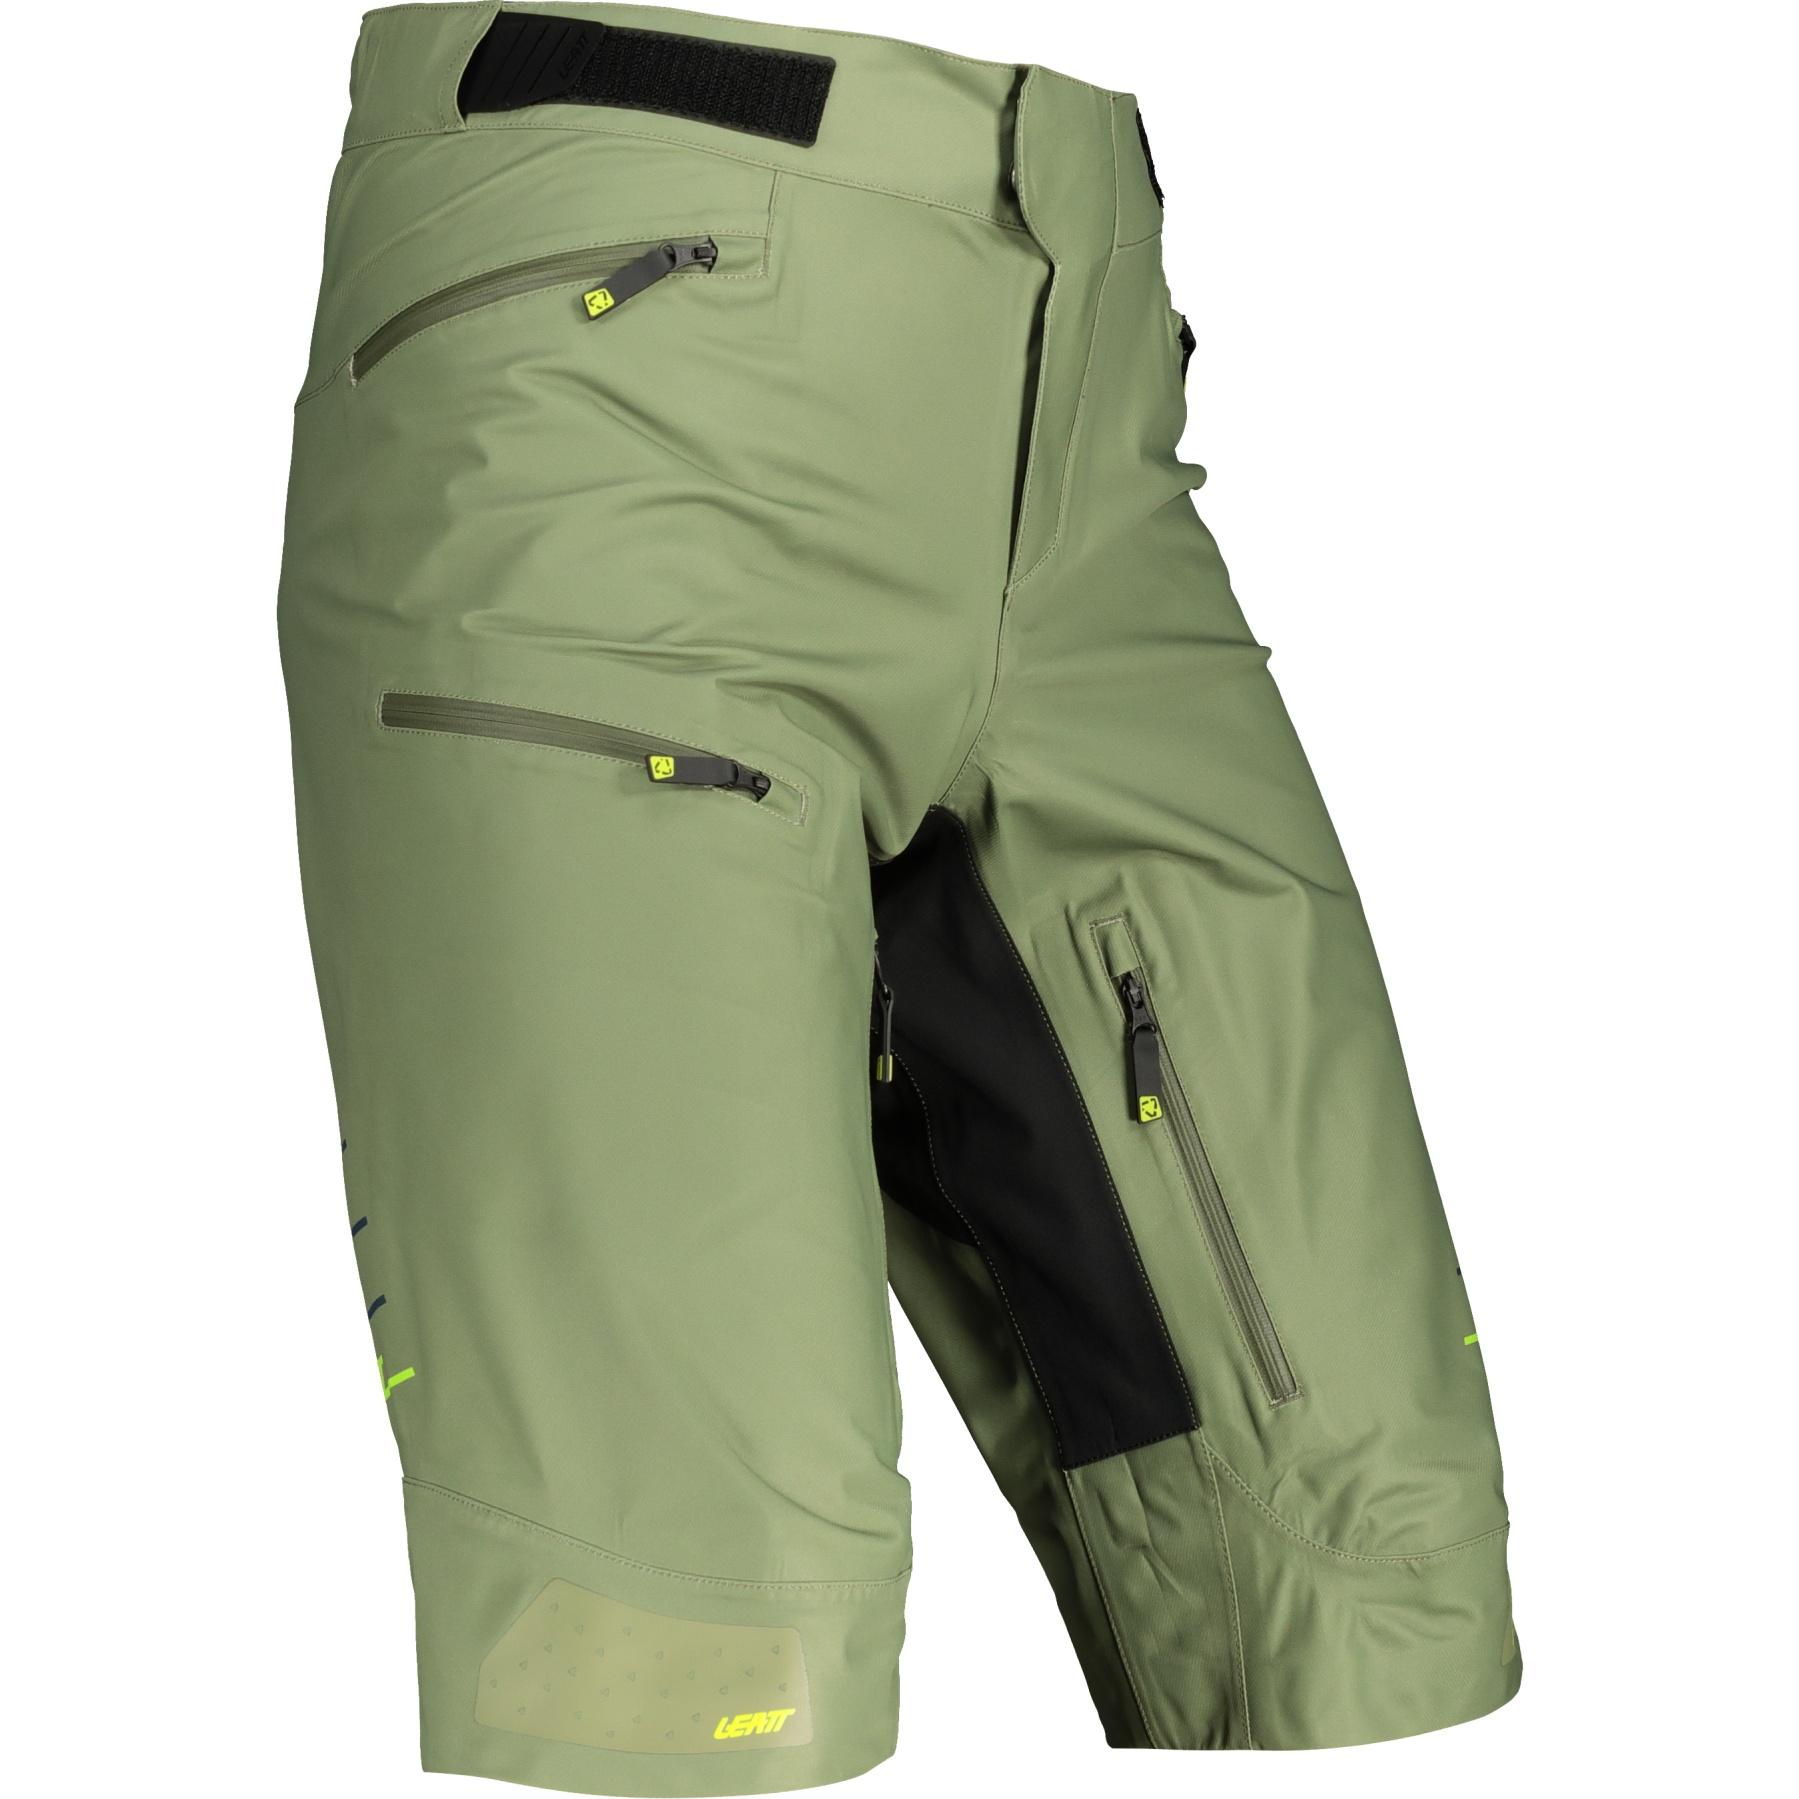 Leatt DBX 5.0 Shorts - cactus